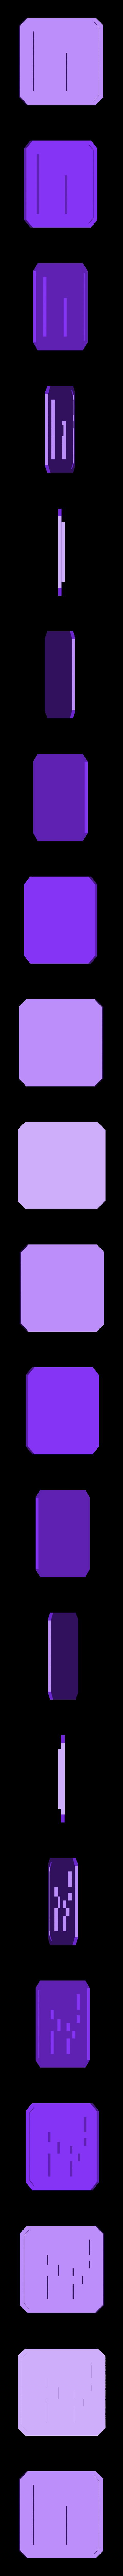 hat-patch.stl Download free STL file Fix It Felix Hammer • 3D printer design, Adafruit